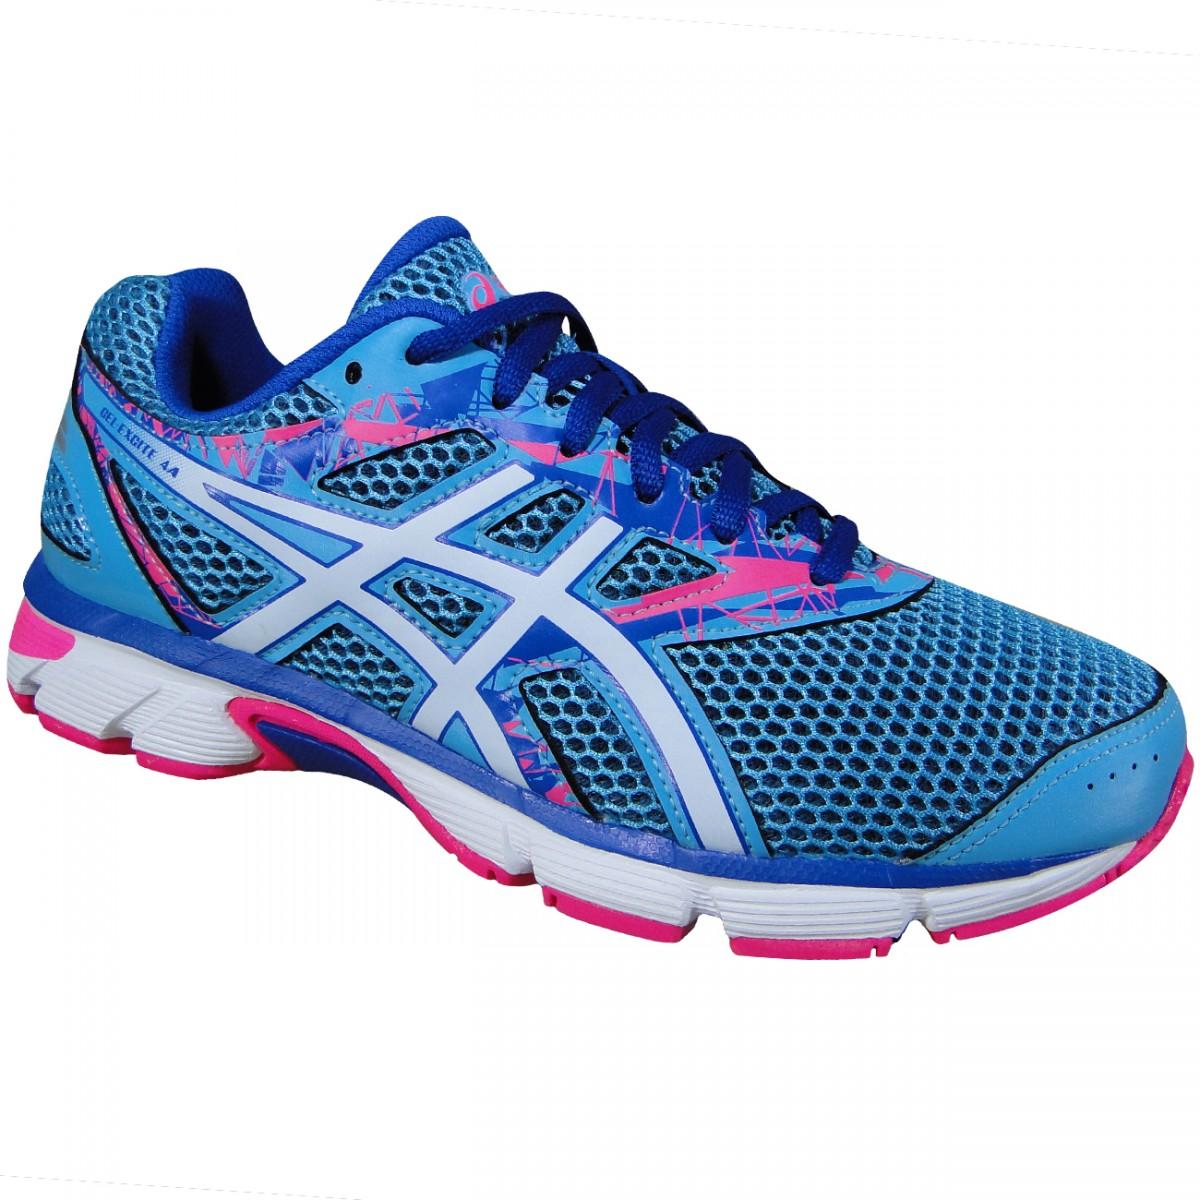 bb12b58592f Tenis Asics Gel-Excite 4 T070A 4820 - Azul Branco Pink - Chuteira Nike